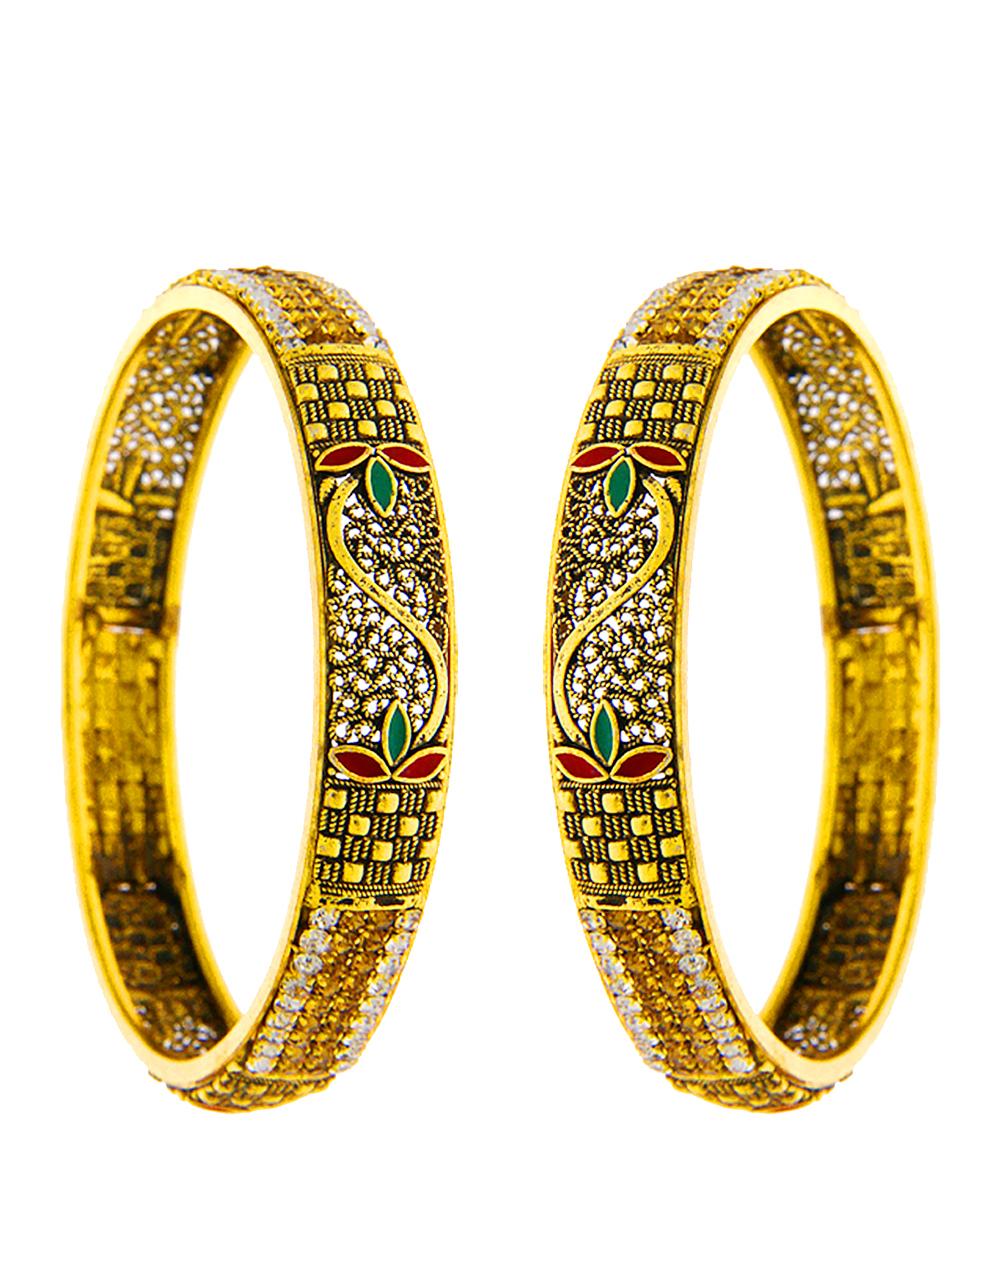 Antique Finish Designer Bangles Studded With Stones Bangles For Women